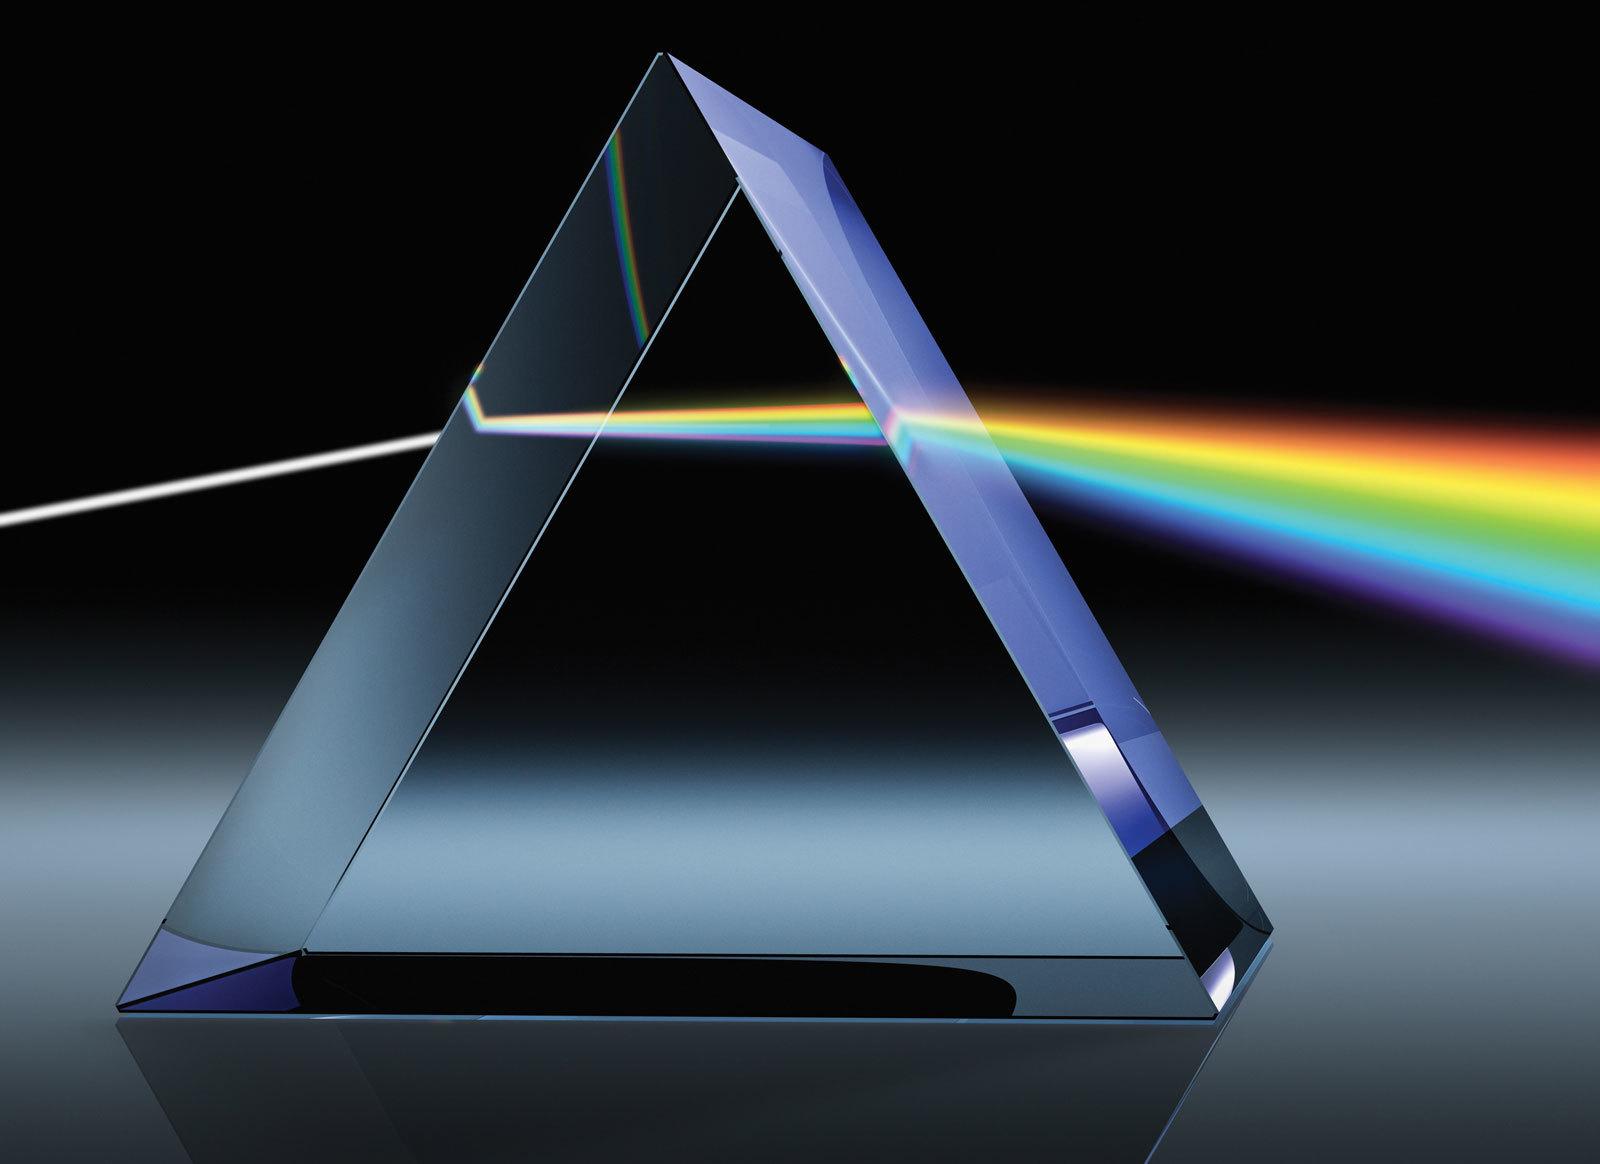 light-prism-color-angle-colors-wavelength-wavelengths